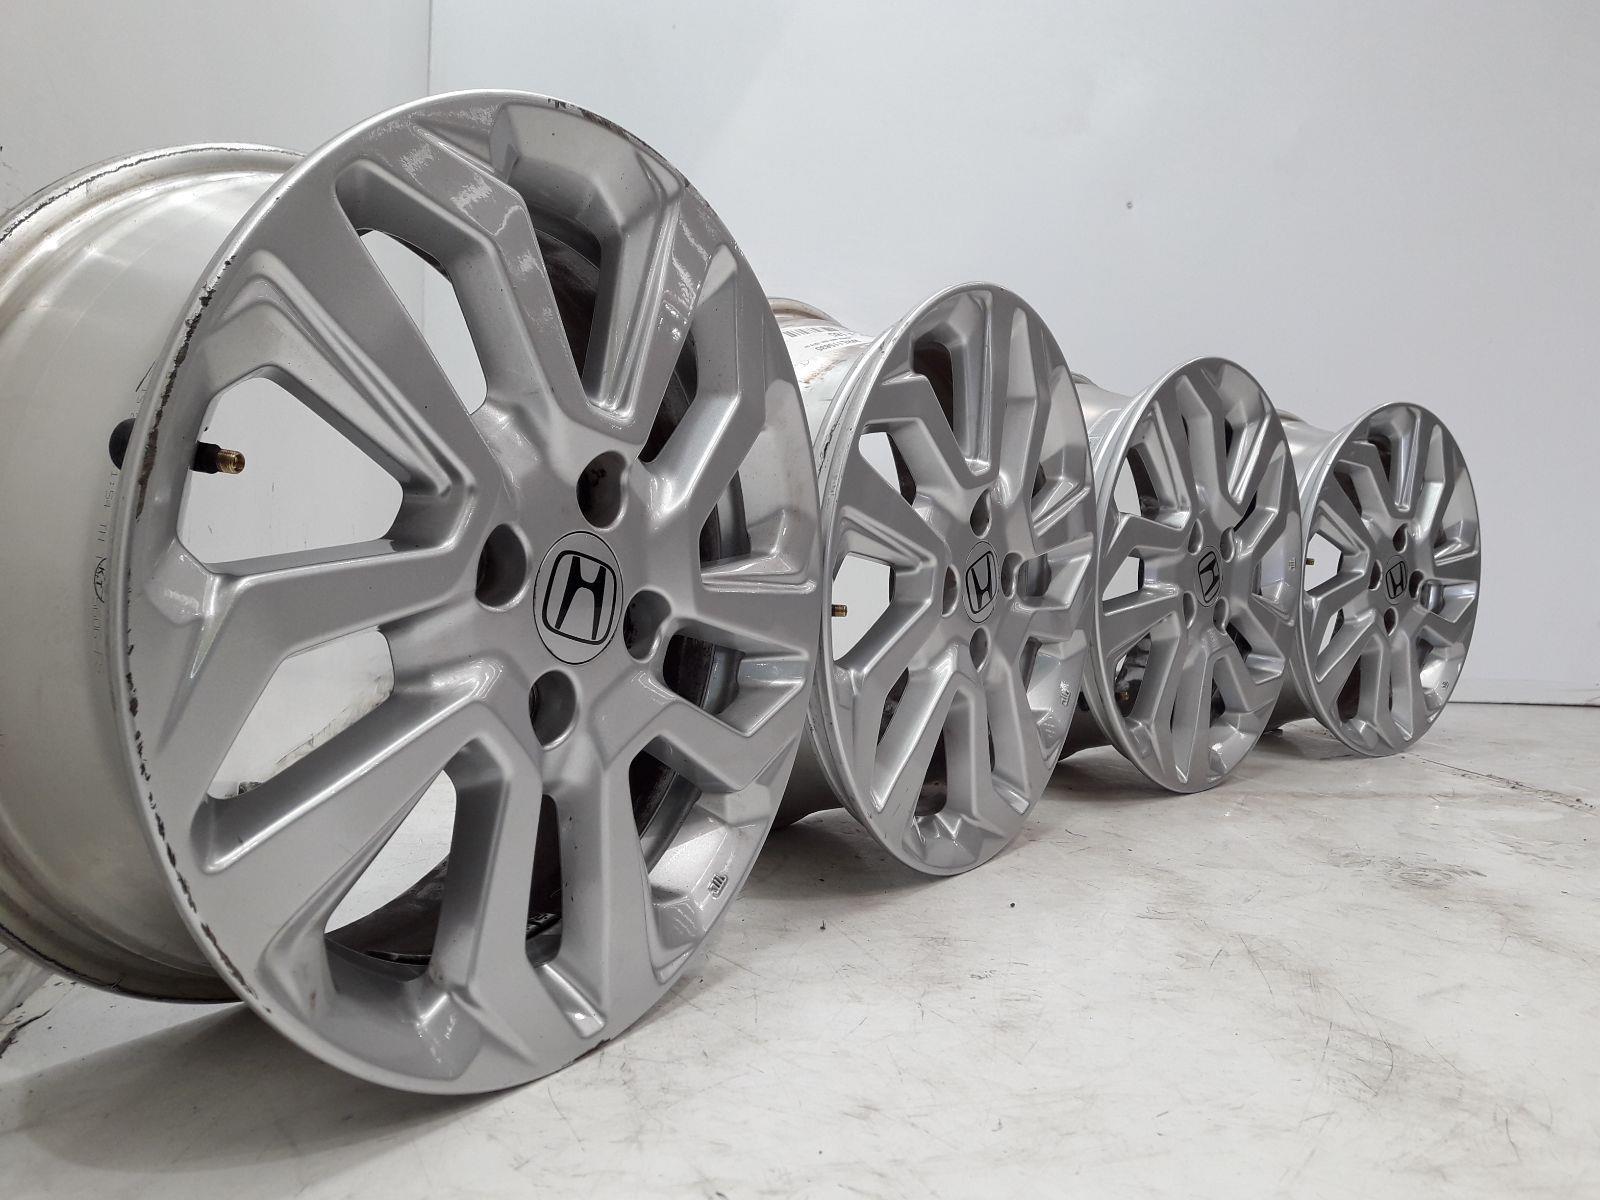 Set Of 2019 Genuine 15 Inch HONDA JAZZ Alloy Wheels Rims 4x100 6x15 ET50